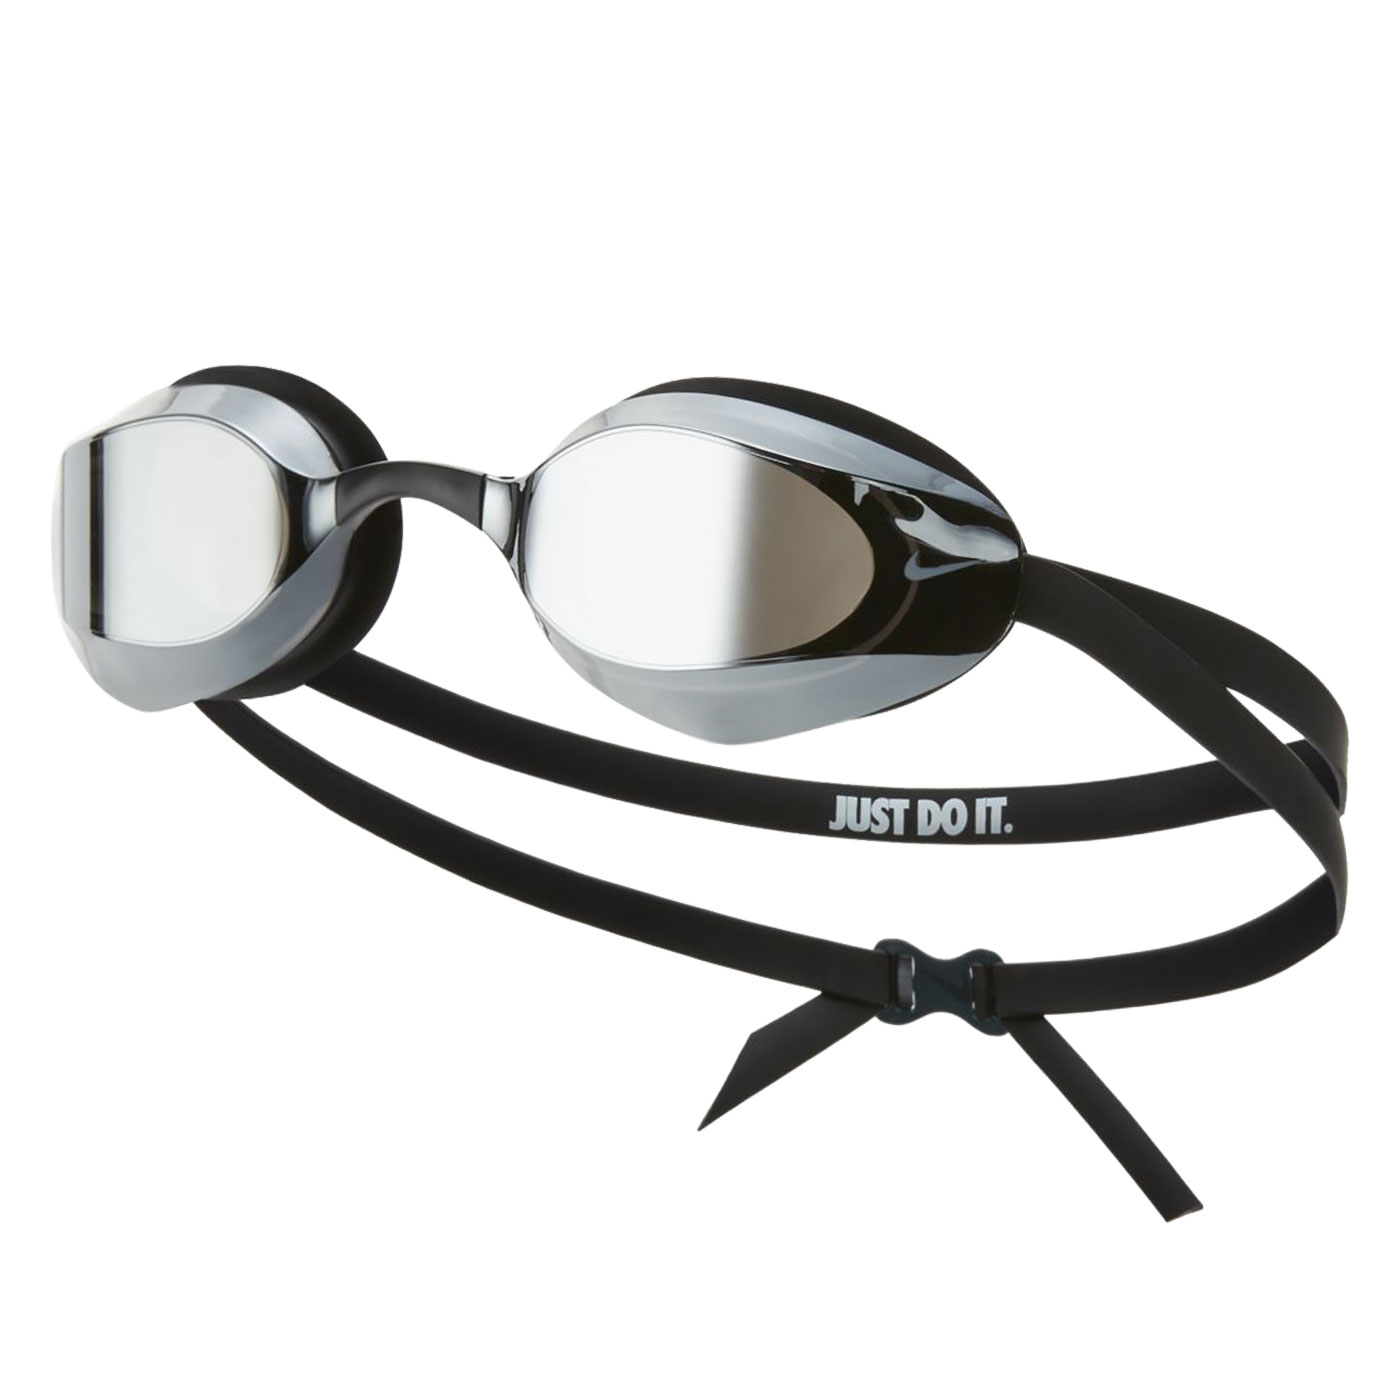 NIKE SWIM 成人專業型鏡面泳鏡 NESSA176-040 - 黑白